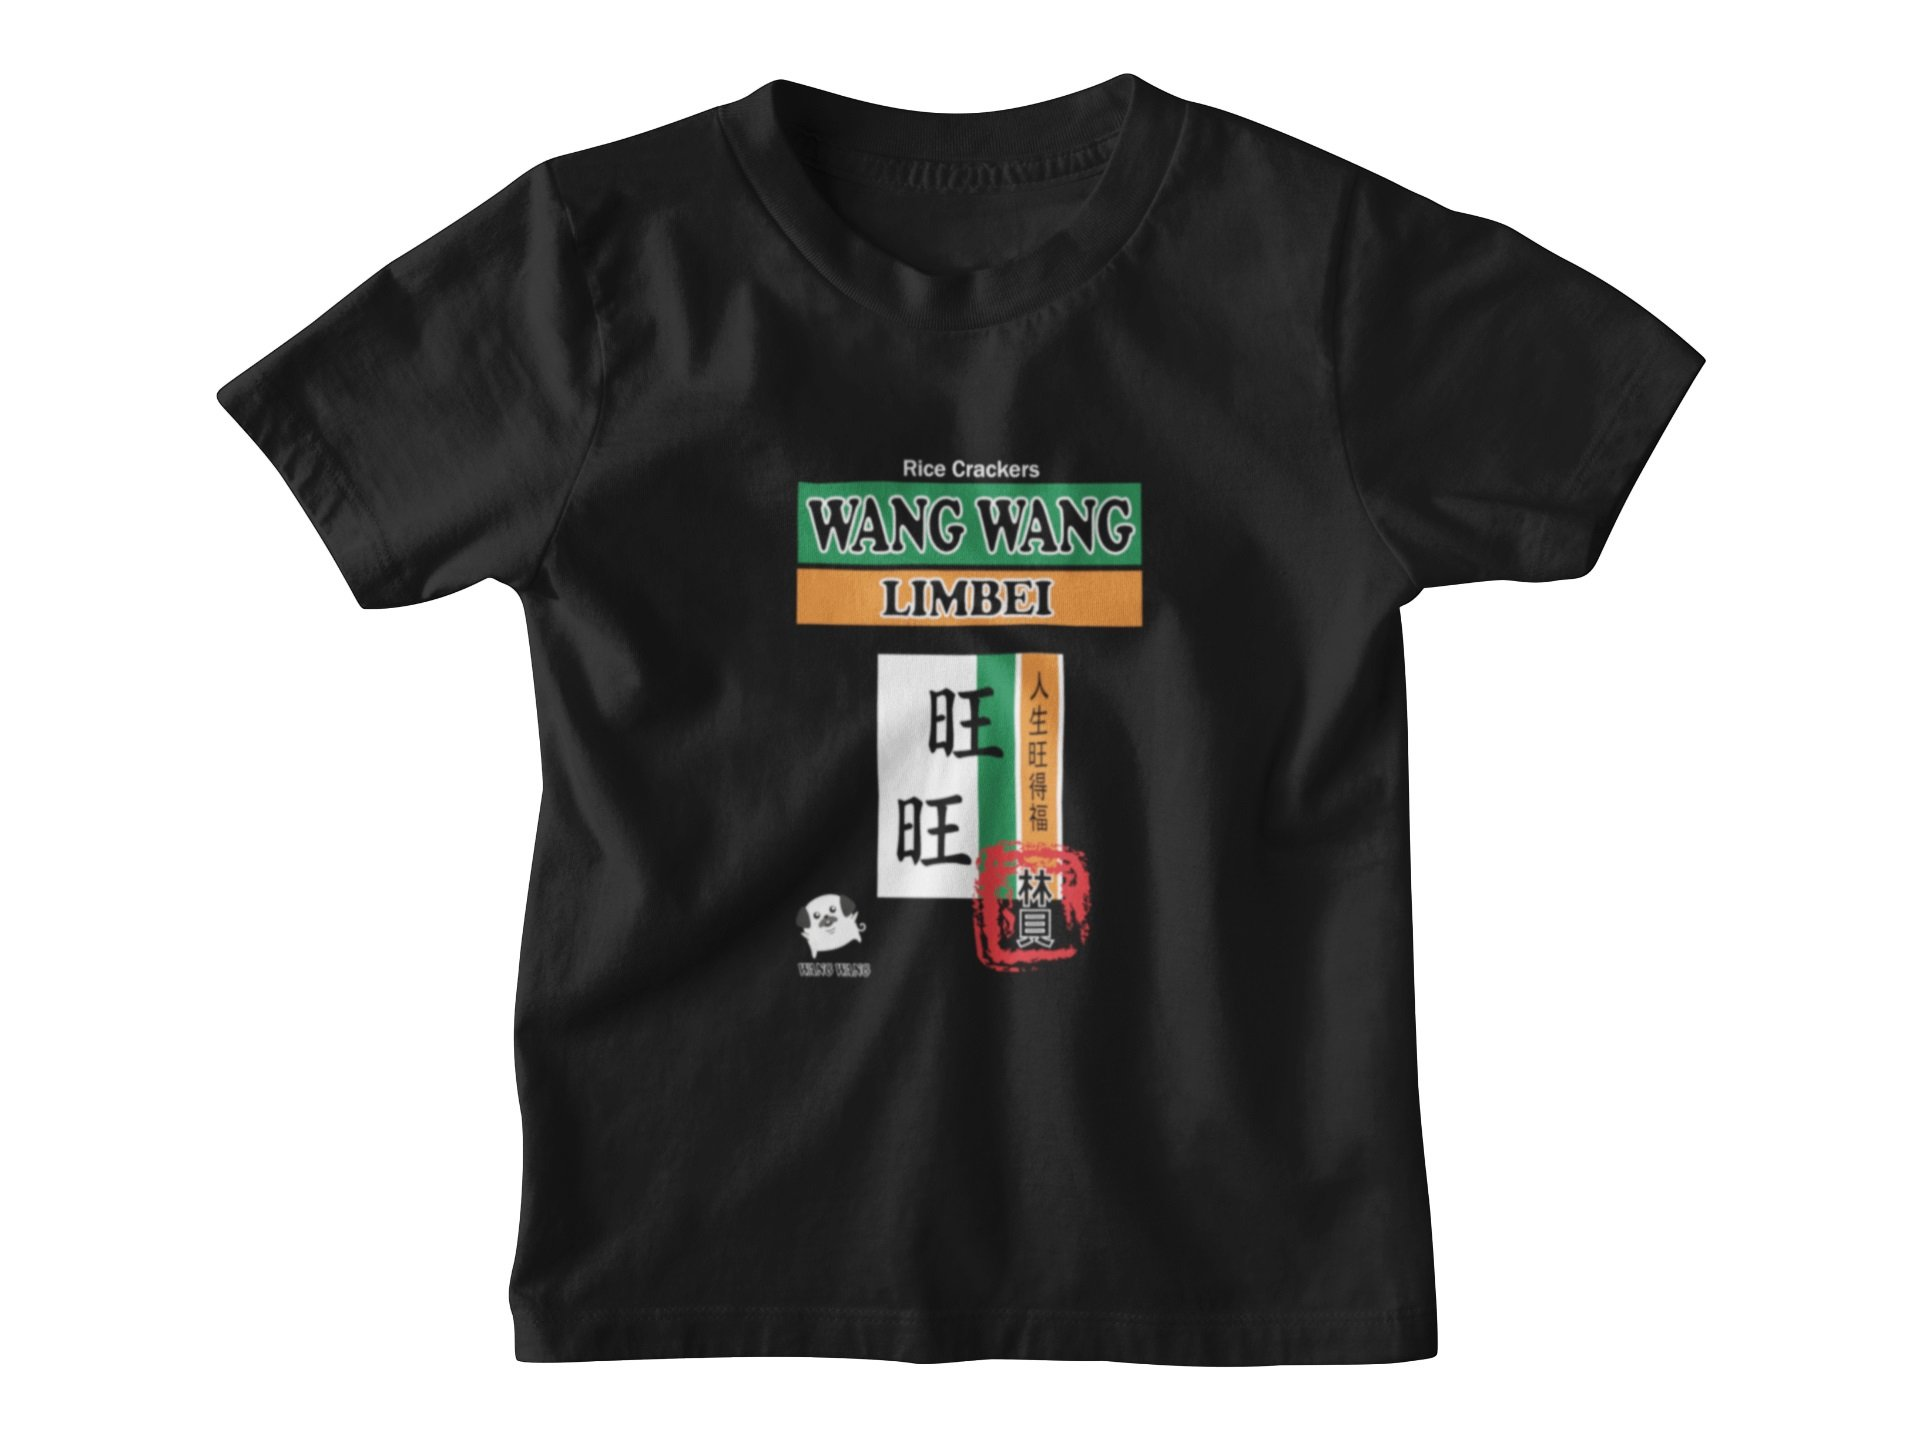 Wang Wang Kids Crew Neck S-Sleeve T-shirt